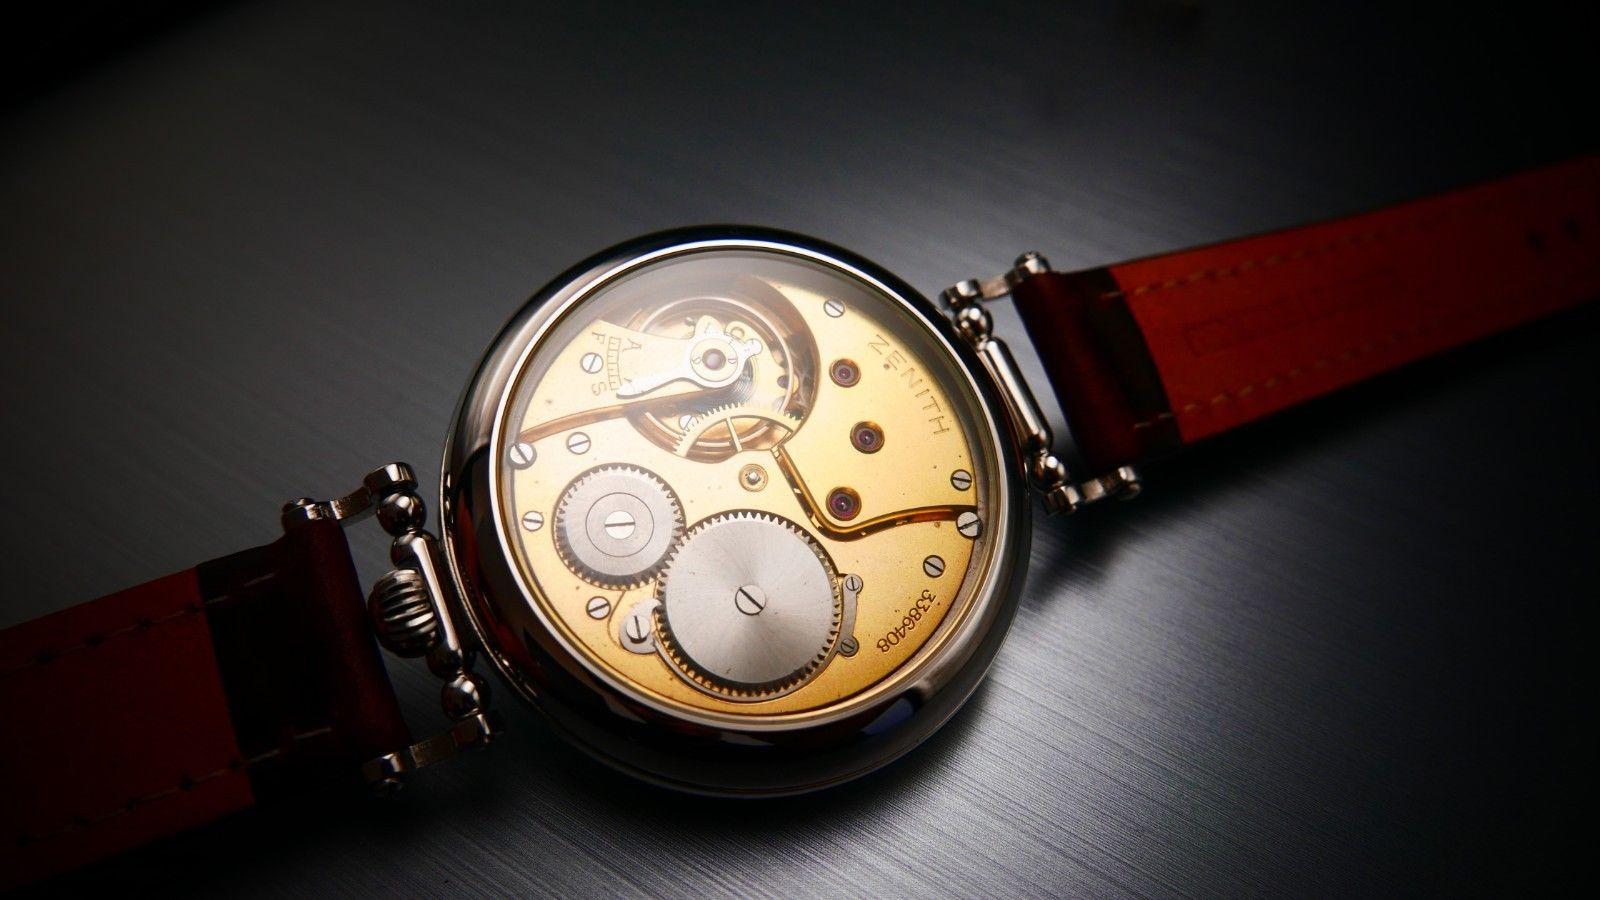 Zenith Antik 1903   Limitovaná edice 1 kus · Zenith hodinky 039 · Zenith  hodinky 040 ... 079ebed85f4